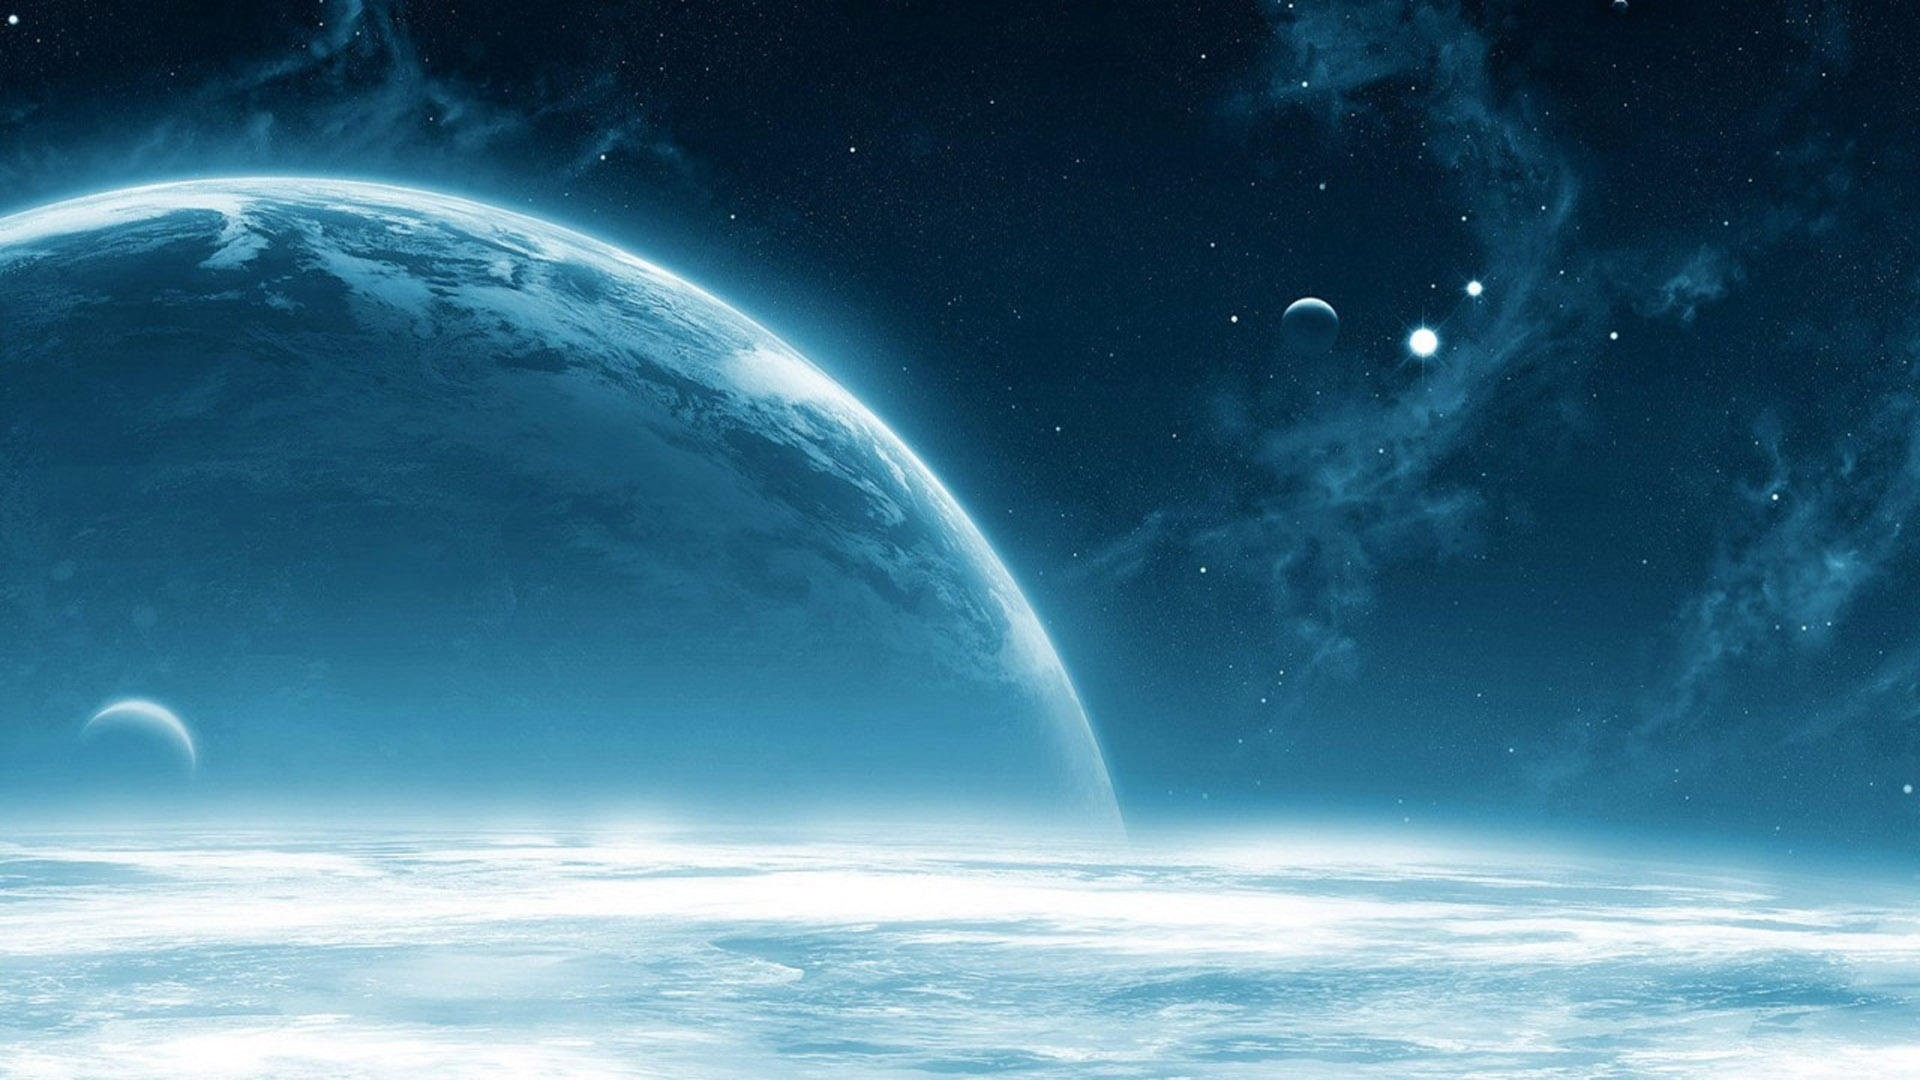 Wallpaper space planet star galaxy nebula sci fi awesome 269